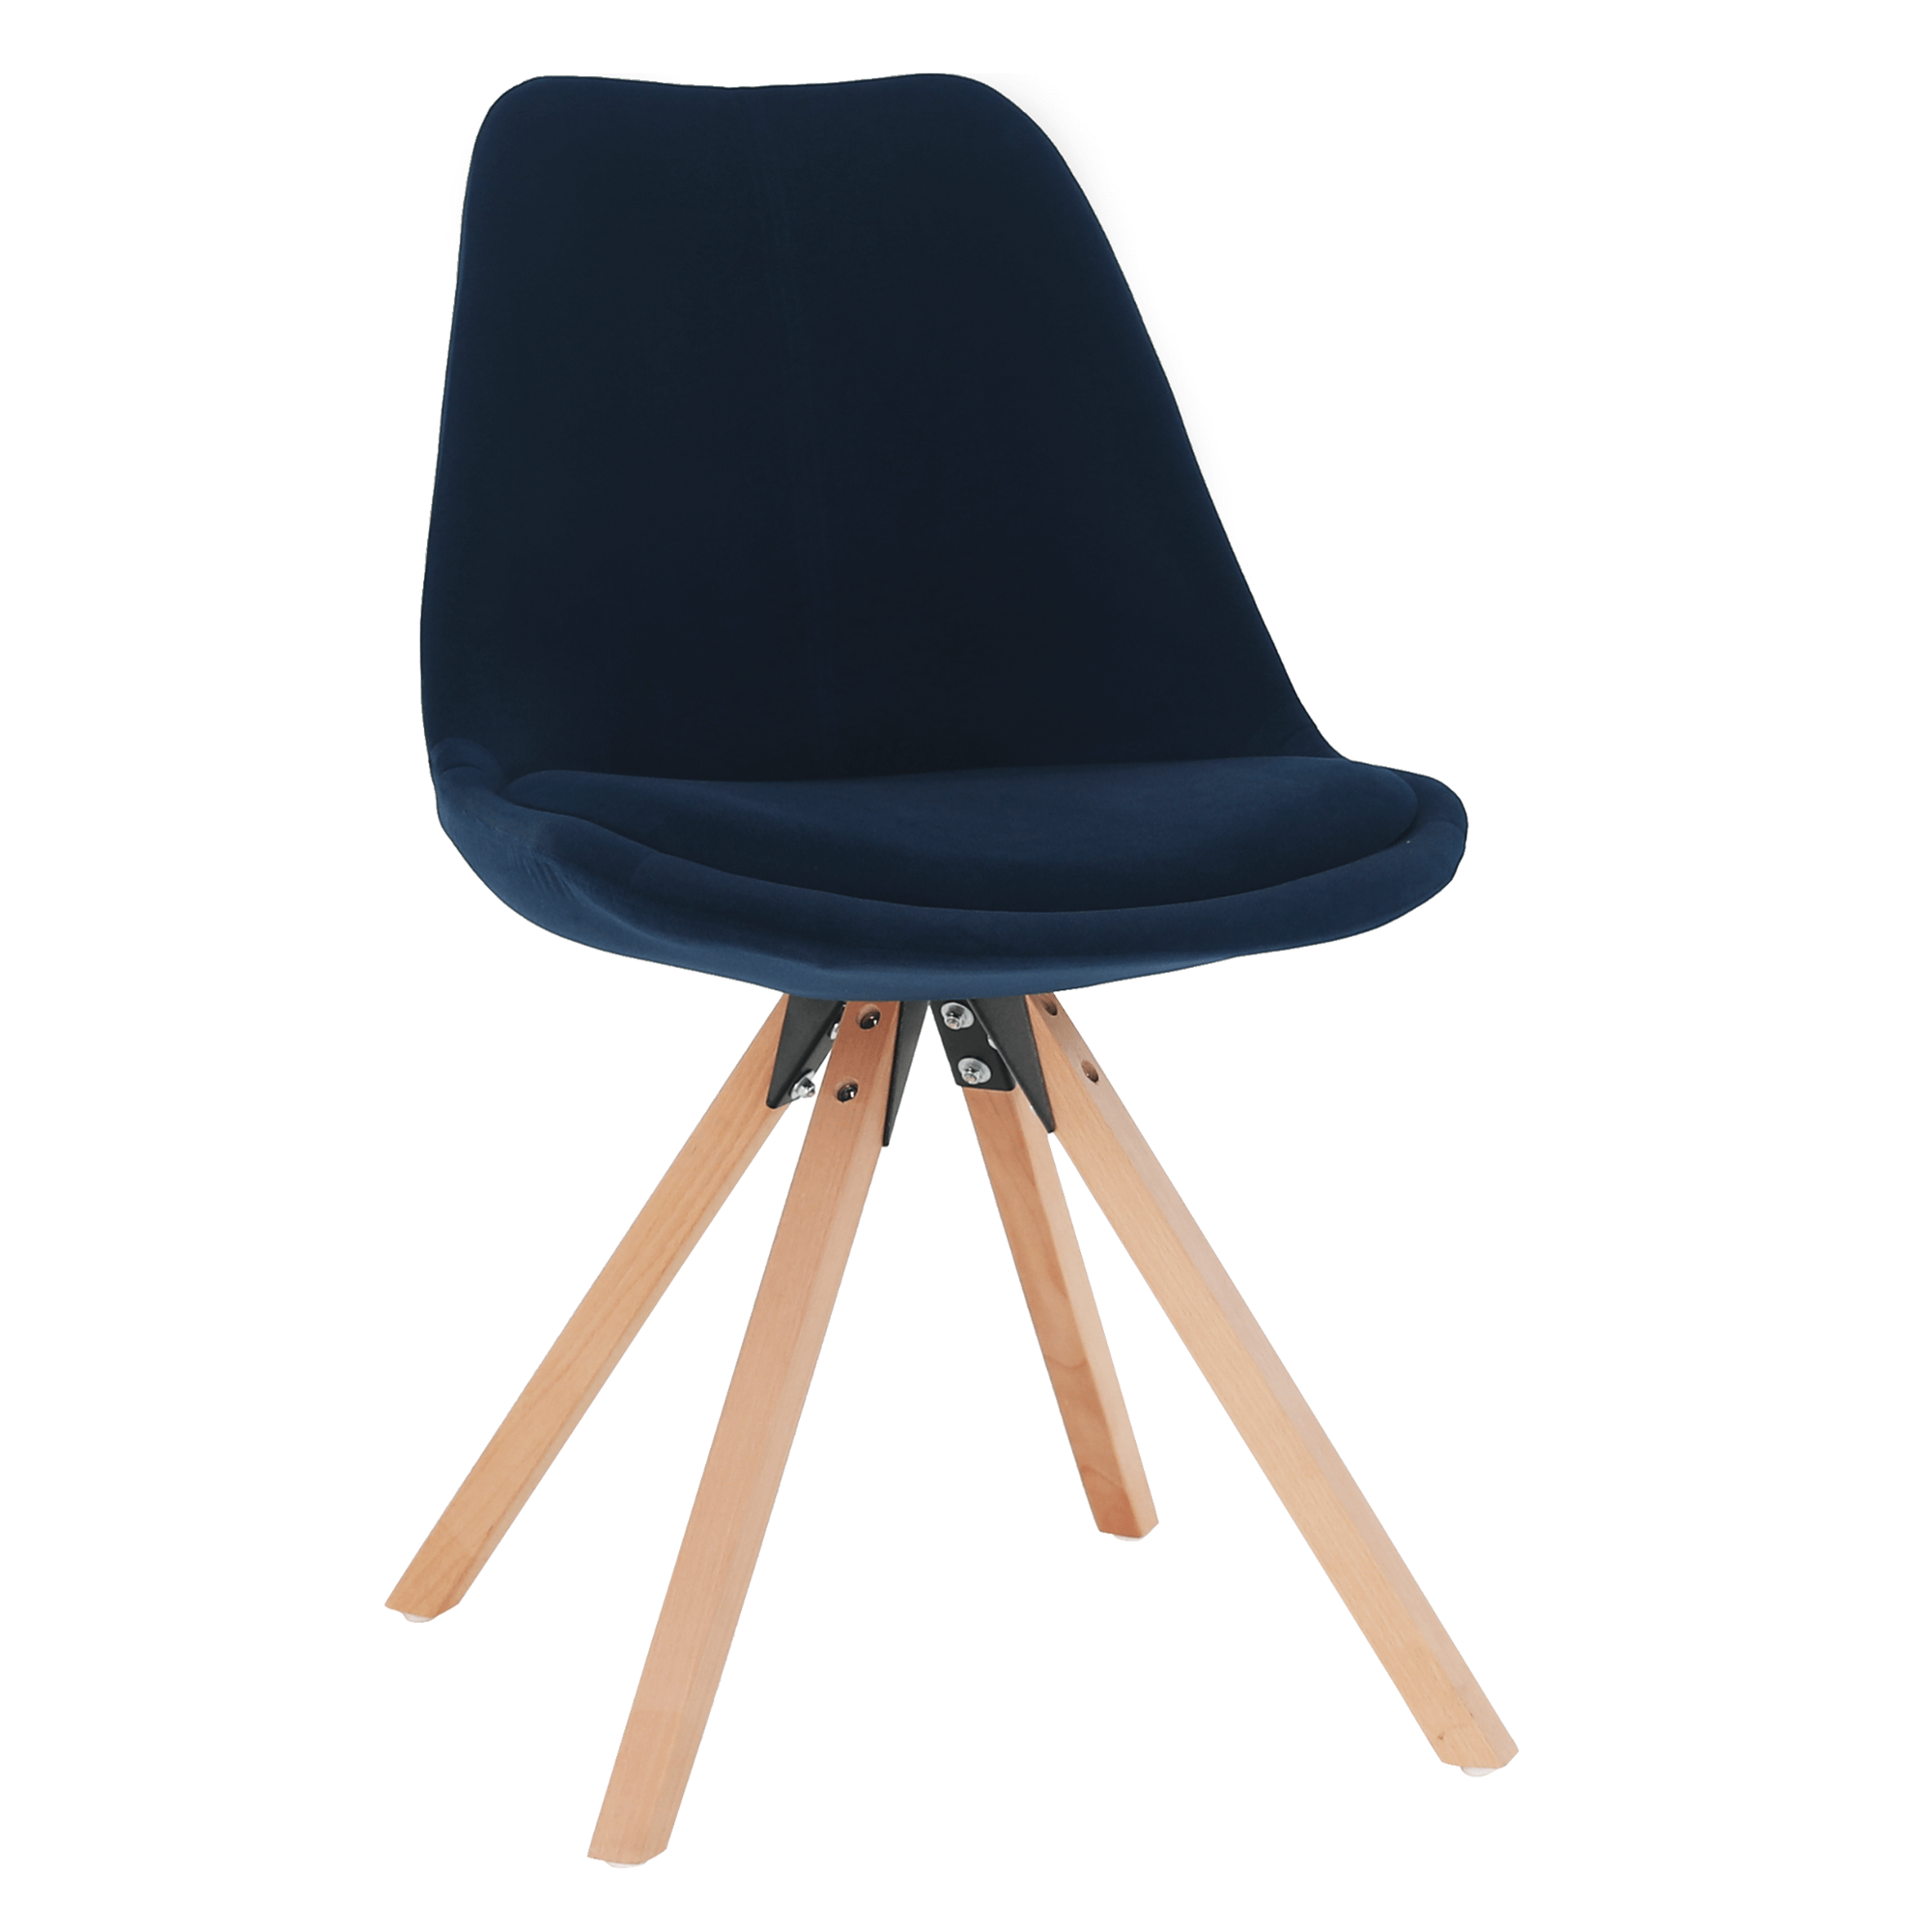 Stolička, modrá Velvet látka/buk, SABRA